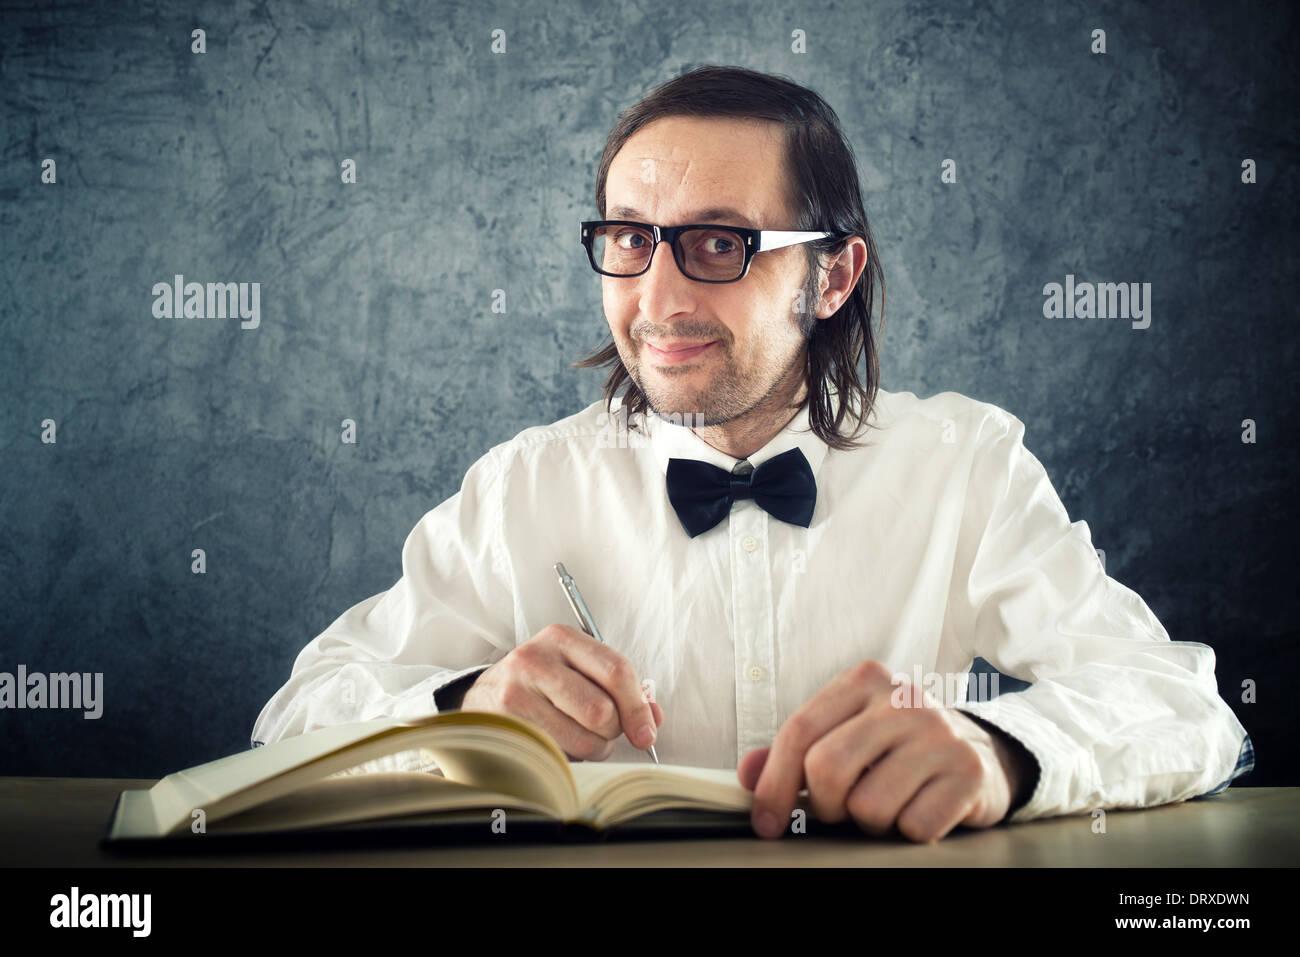 Nerd poet writing poems, sitting at work desk. - Stock Image